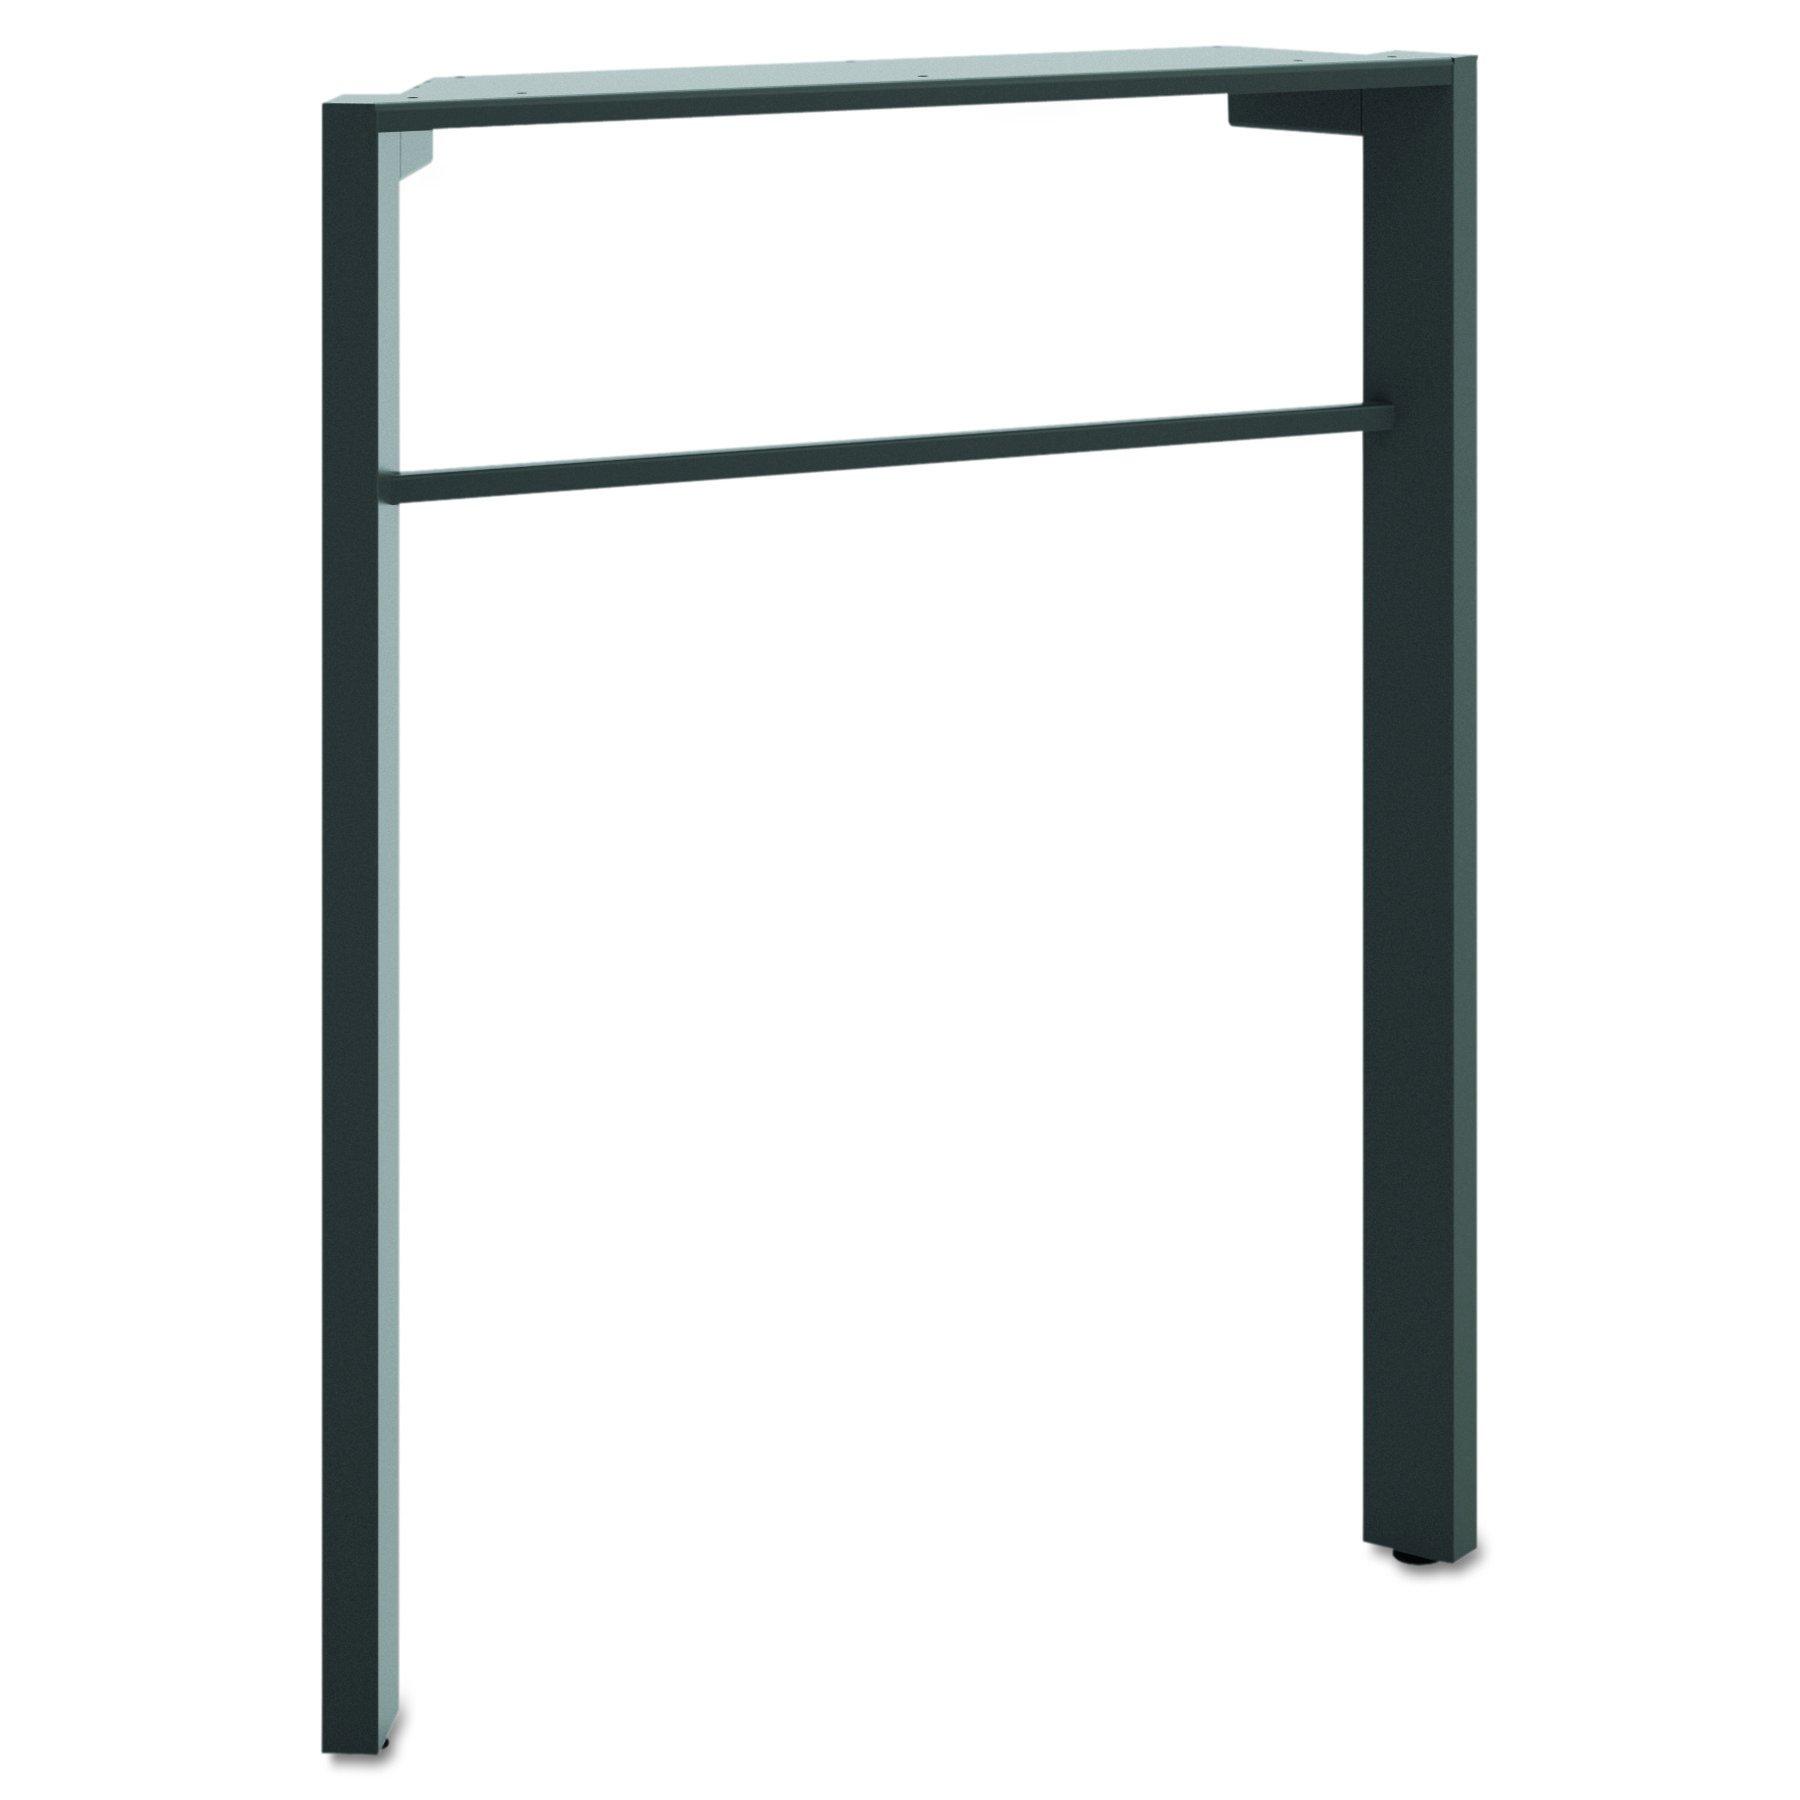 HON The Company BSXMGDLEGA1 Manage Series Desk Leg, Ash Metallic Finish (HMNGDLEG), 28 1/2-Inch,